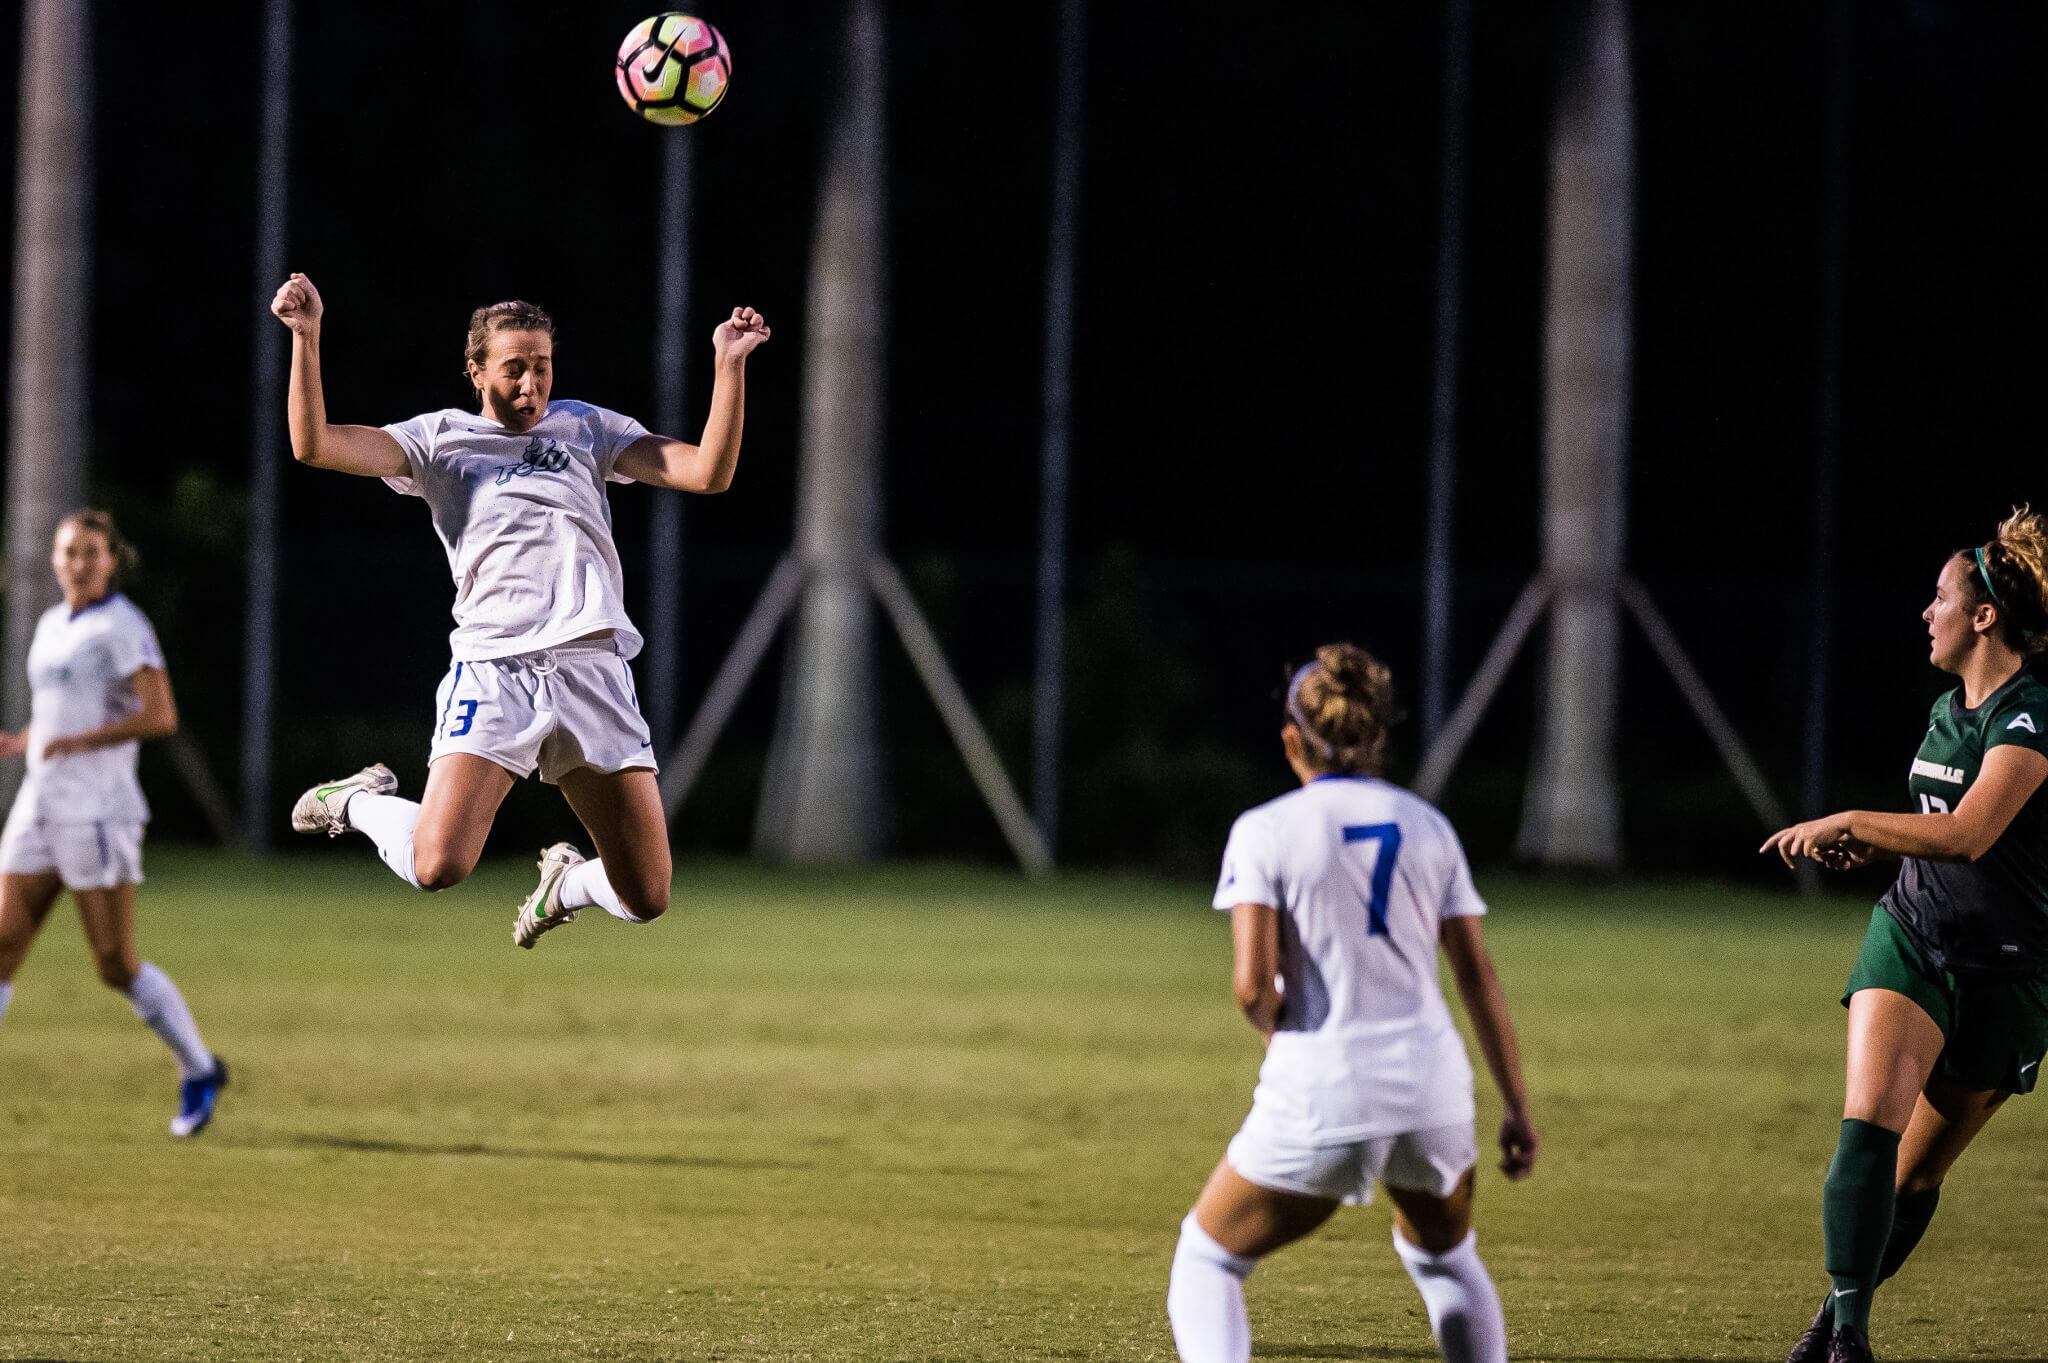 FGCU women's soccer earns seventh consecutive ASUN regular-season title